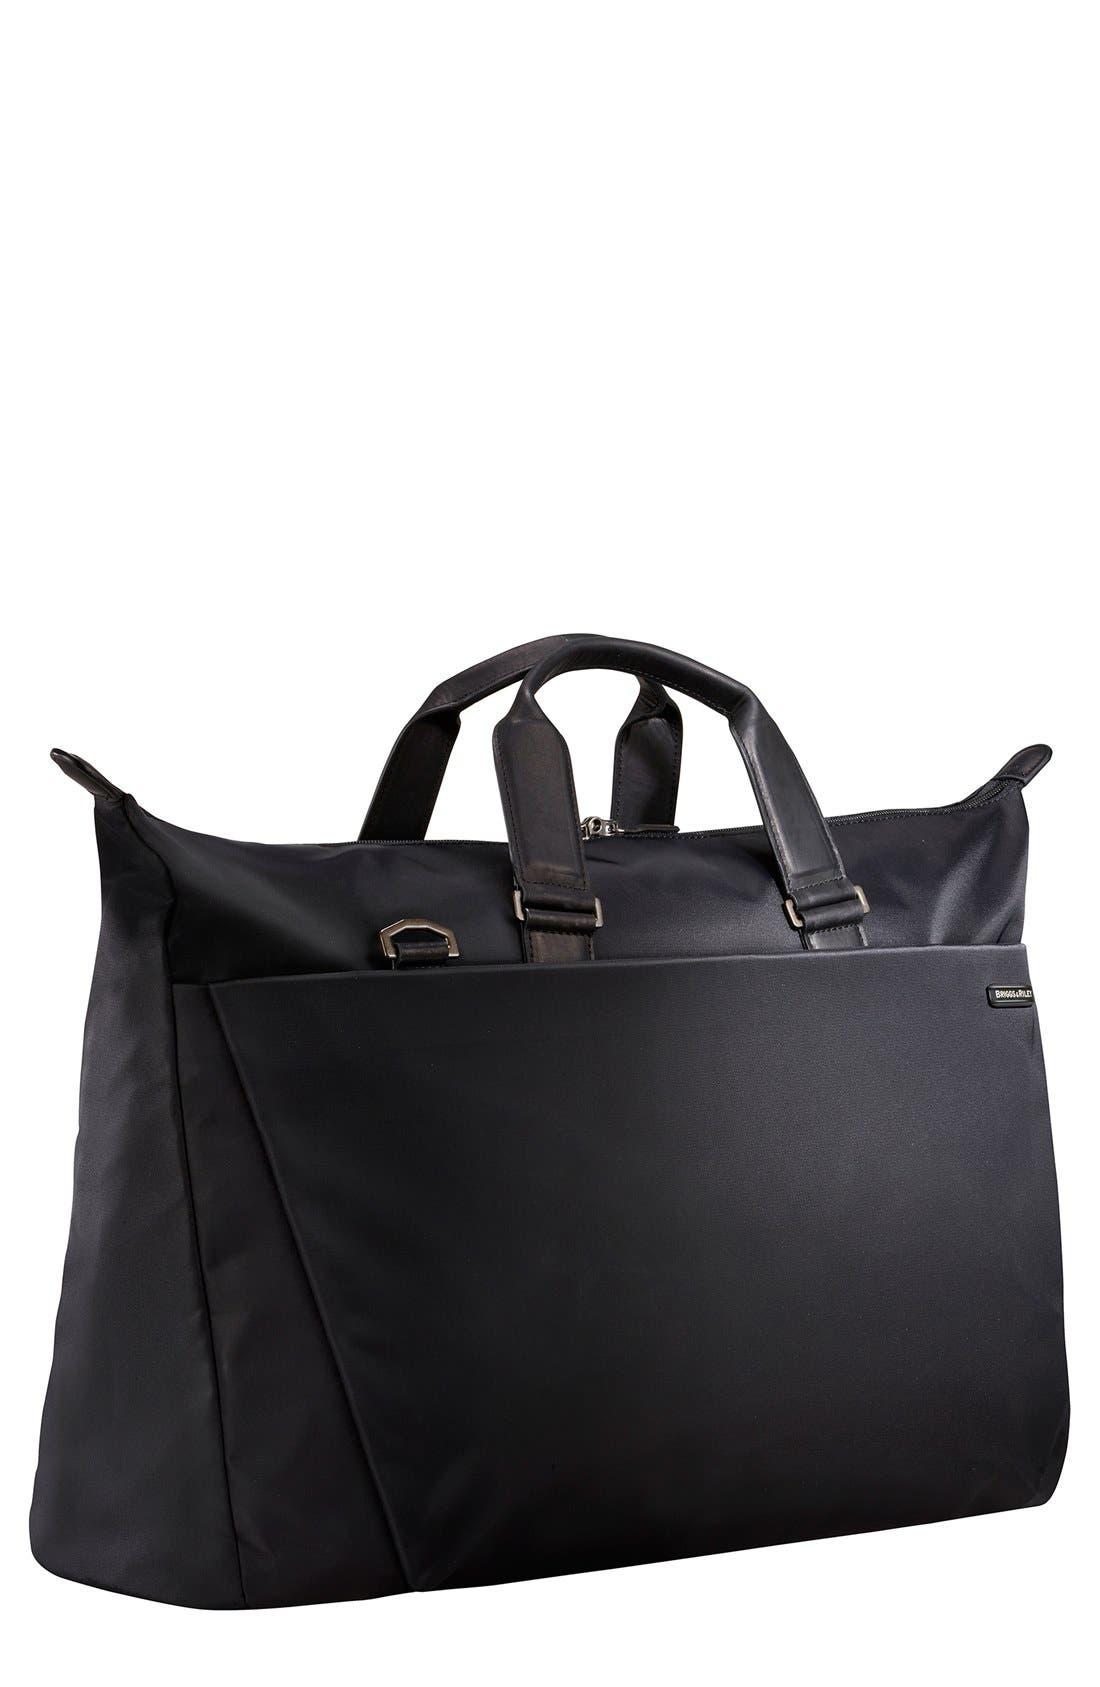 Sympatico 22-Inch Duffel Bag,                         Main,                         color, Black